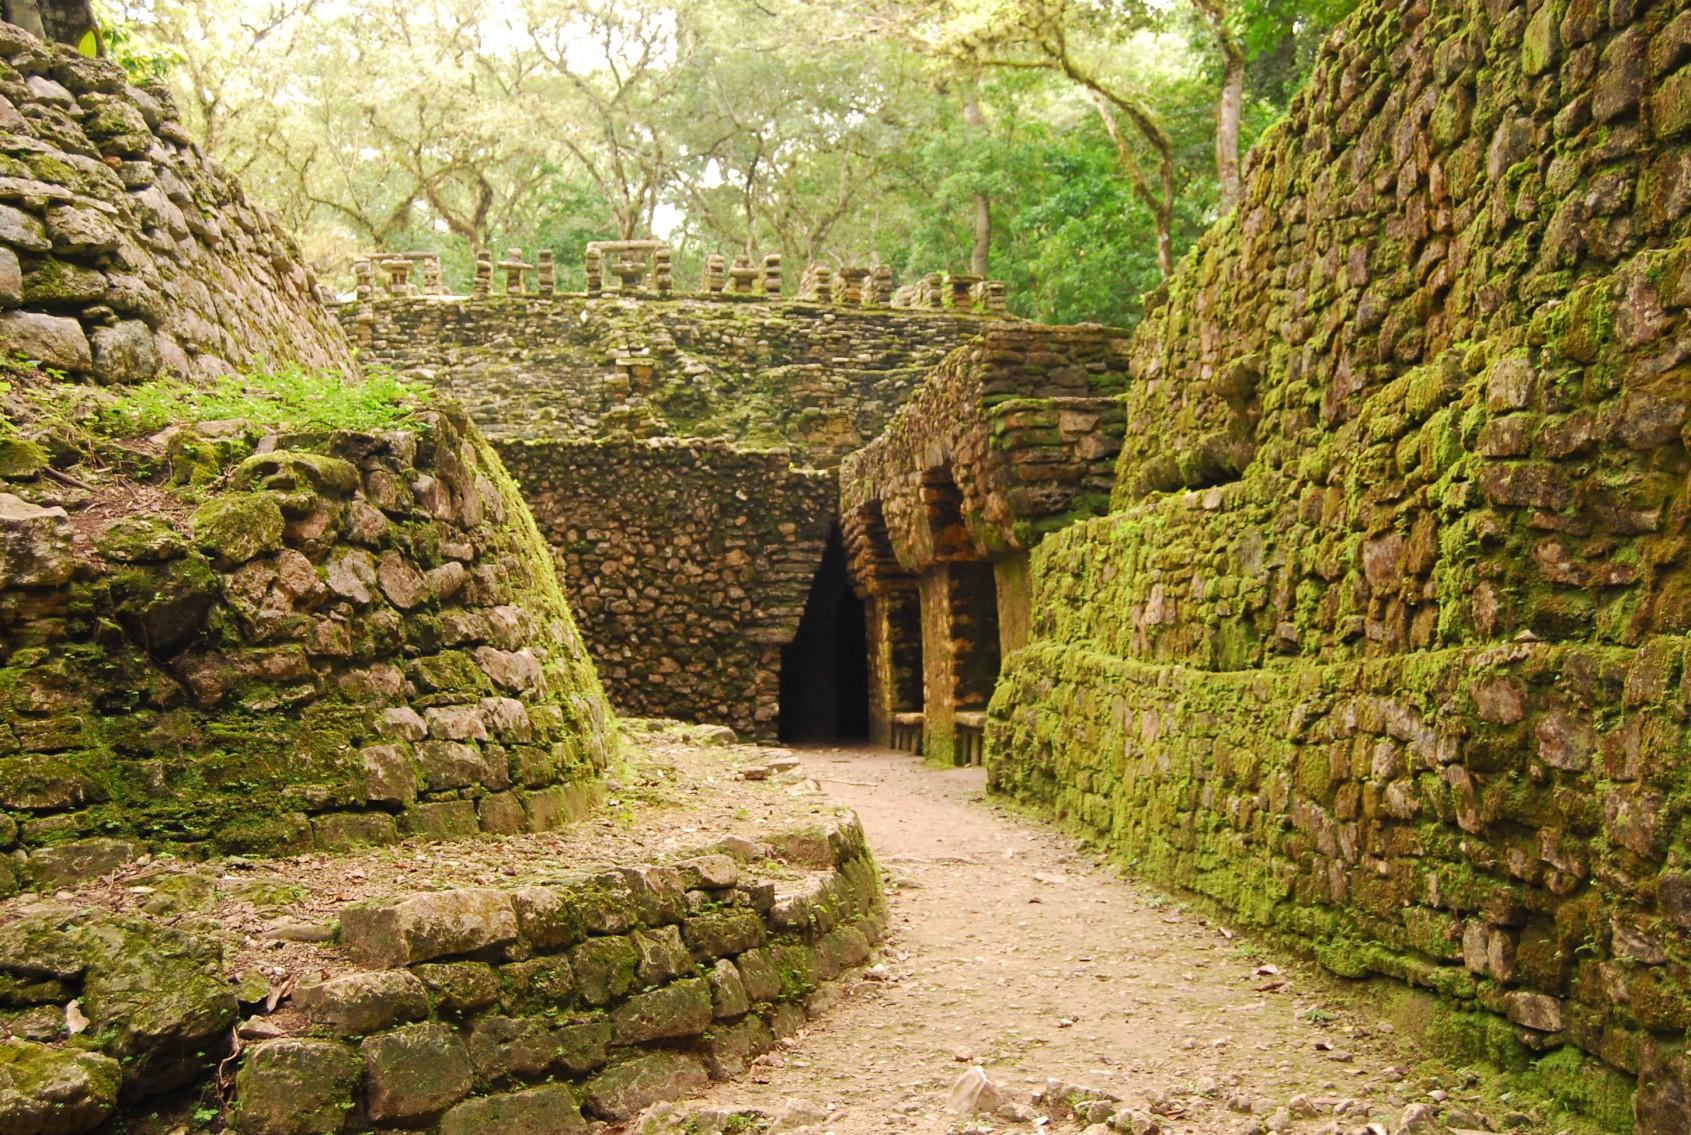 mex18-visit-remote-mayan-cities-free-mn